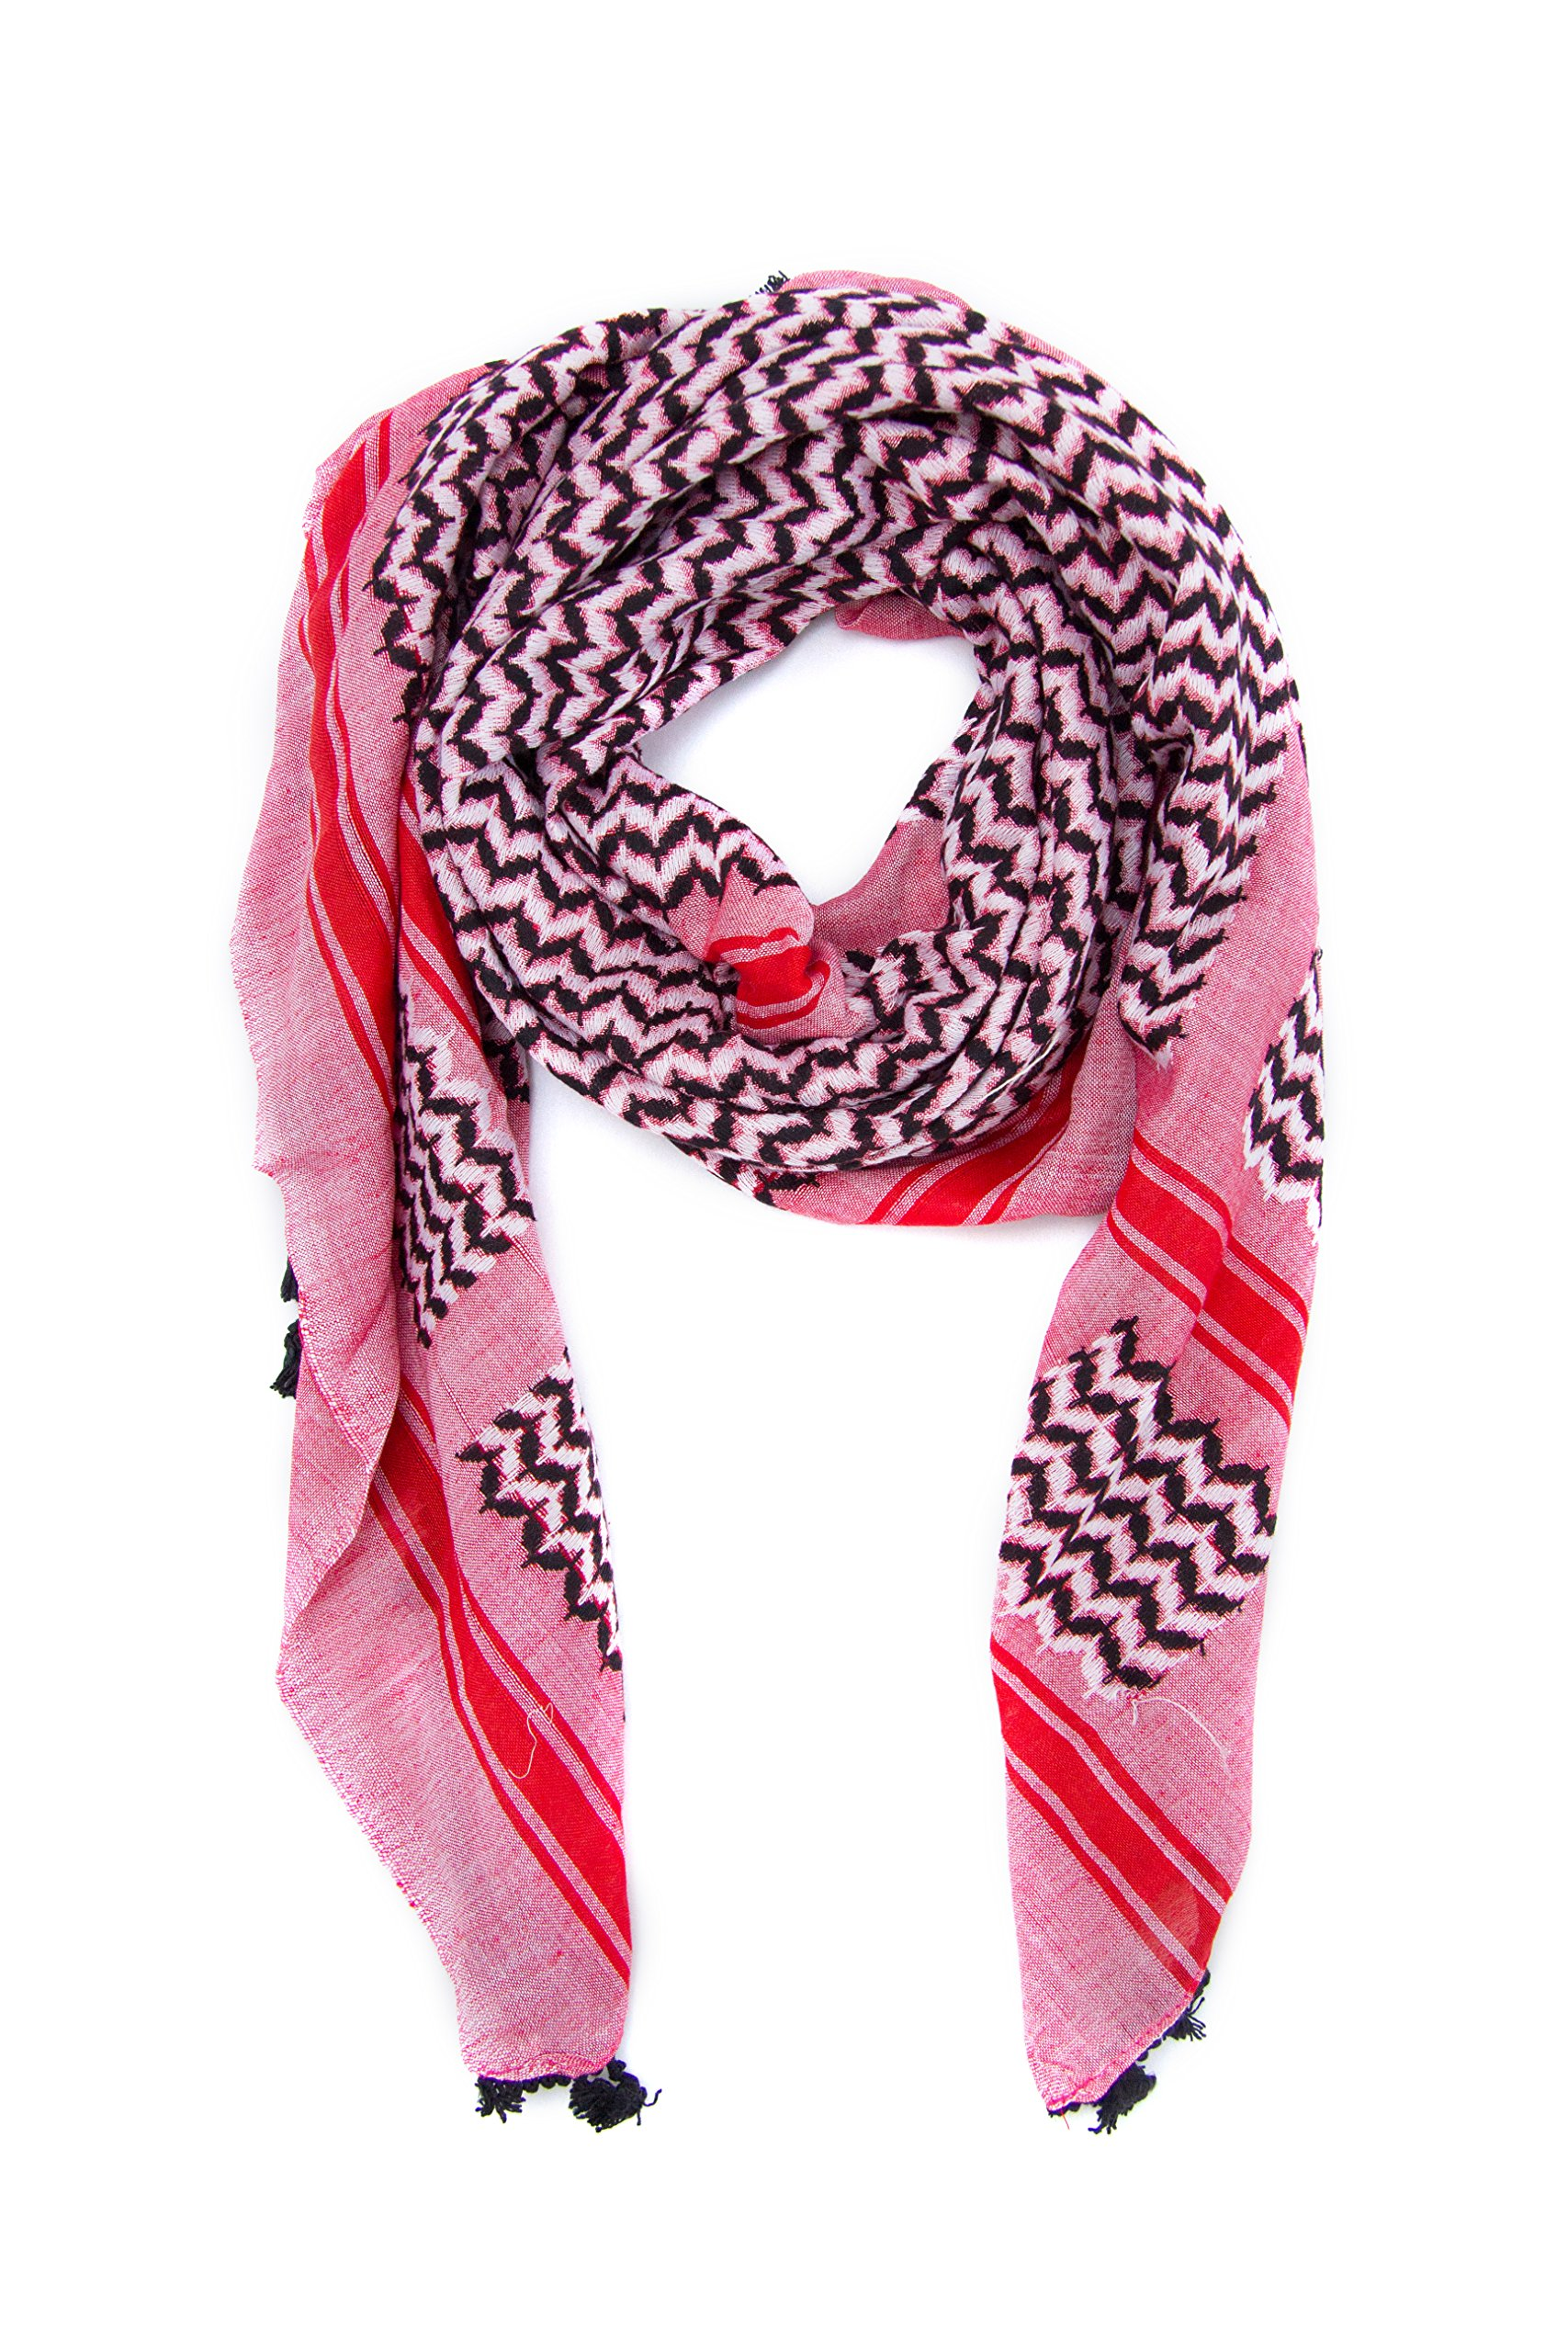 Hirbawi Premium Arabic Scarf 100% Cotton Shemagh Keffiyeh 47''x47'' Arab Scarf (Pink Zahra) Made in Palestine by Hirbawi (Image #4)